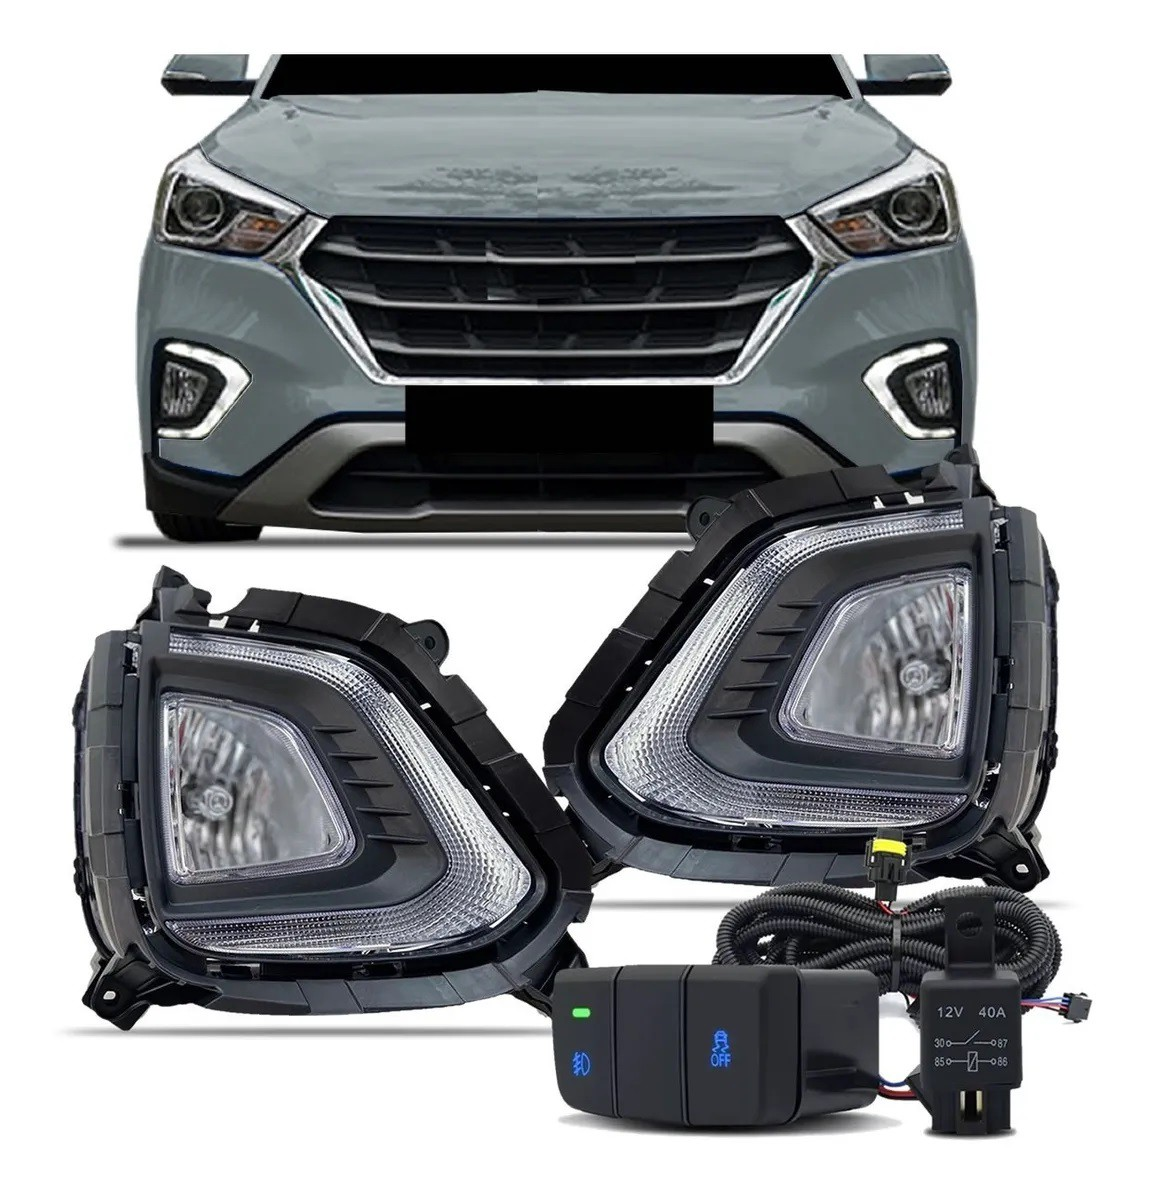 Kit Farol de Milha Neblina Hyundai Creta 2020 2021 - Interrup Original + Luz Diurna DRL + Led Pisca Sequencial